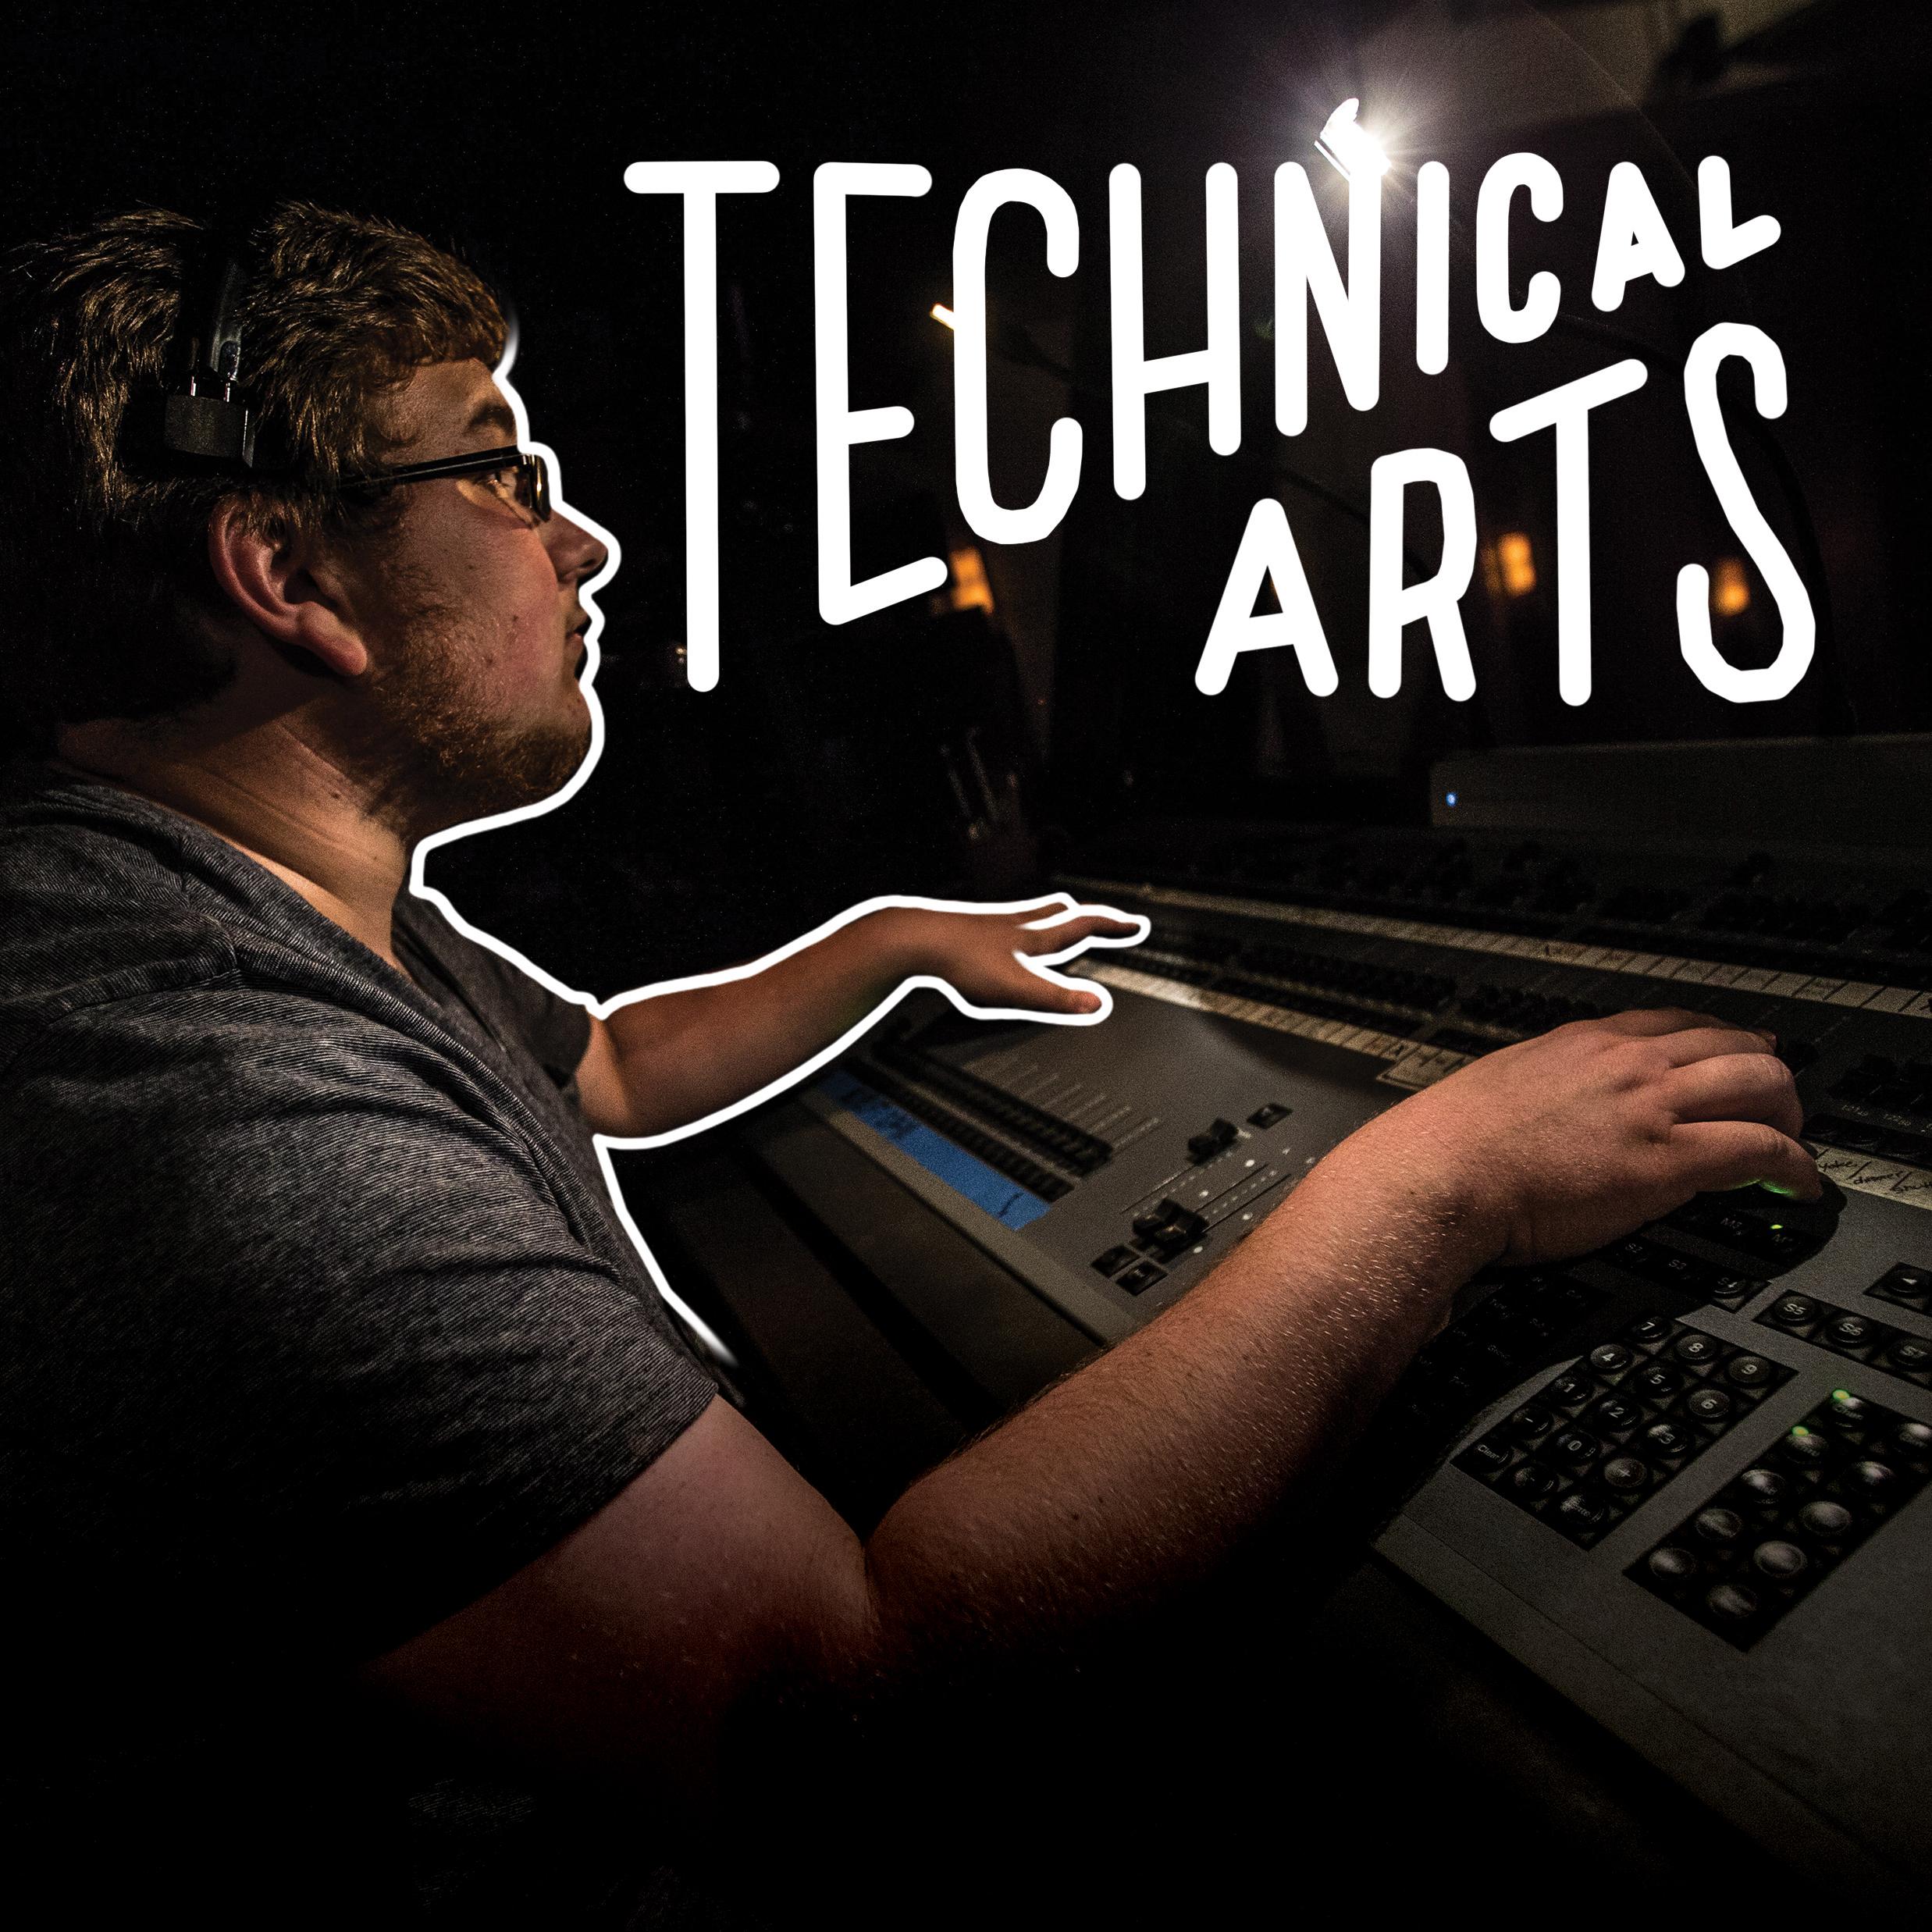 TechnicalArts_Web.jpg